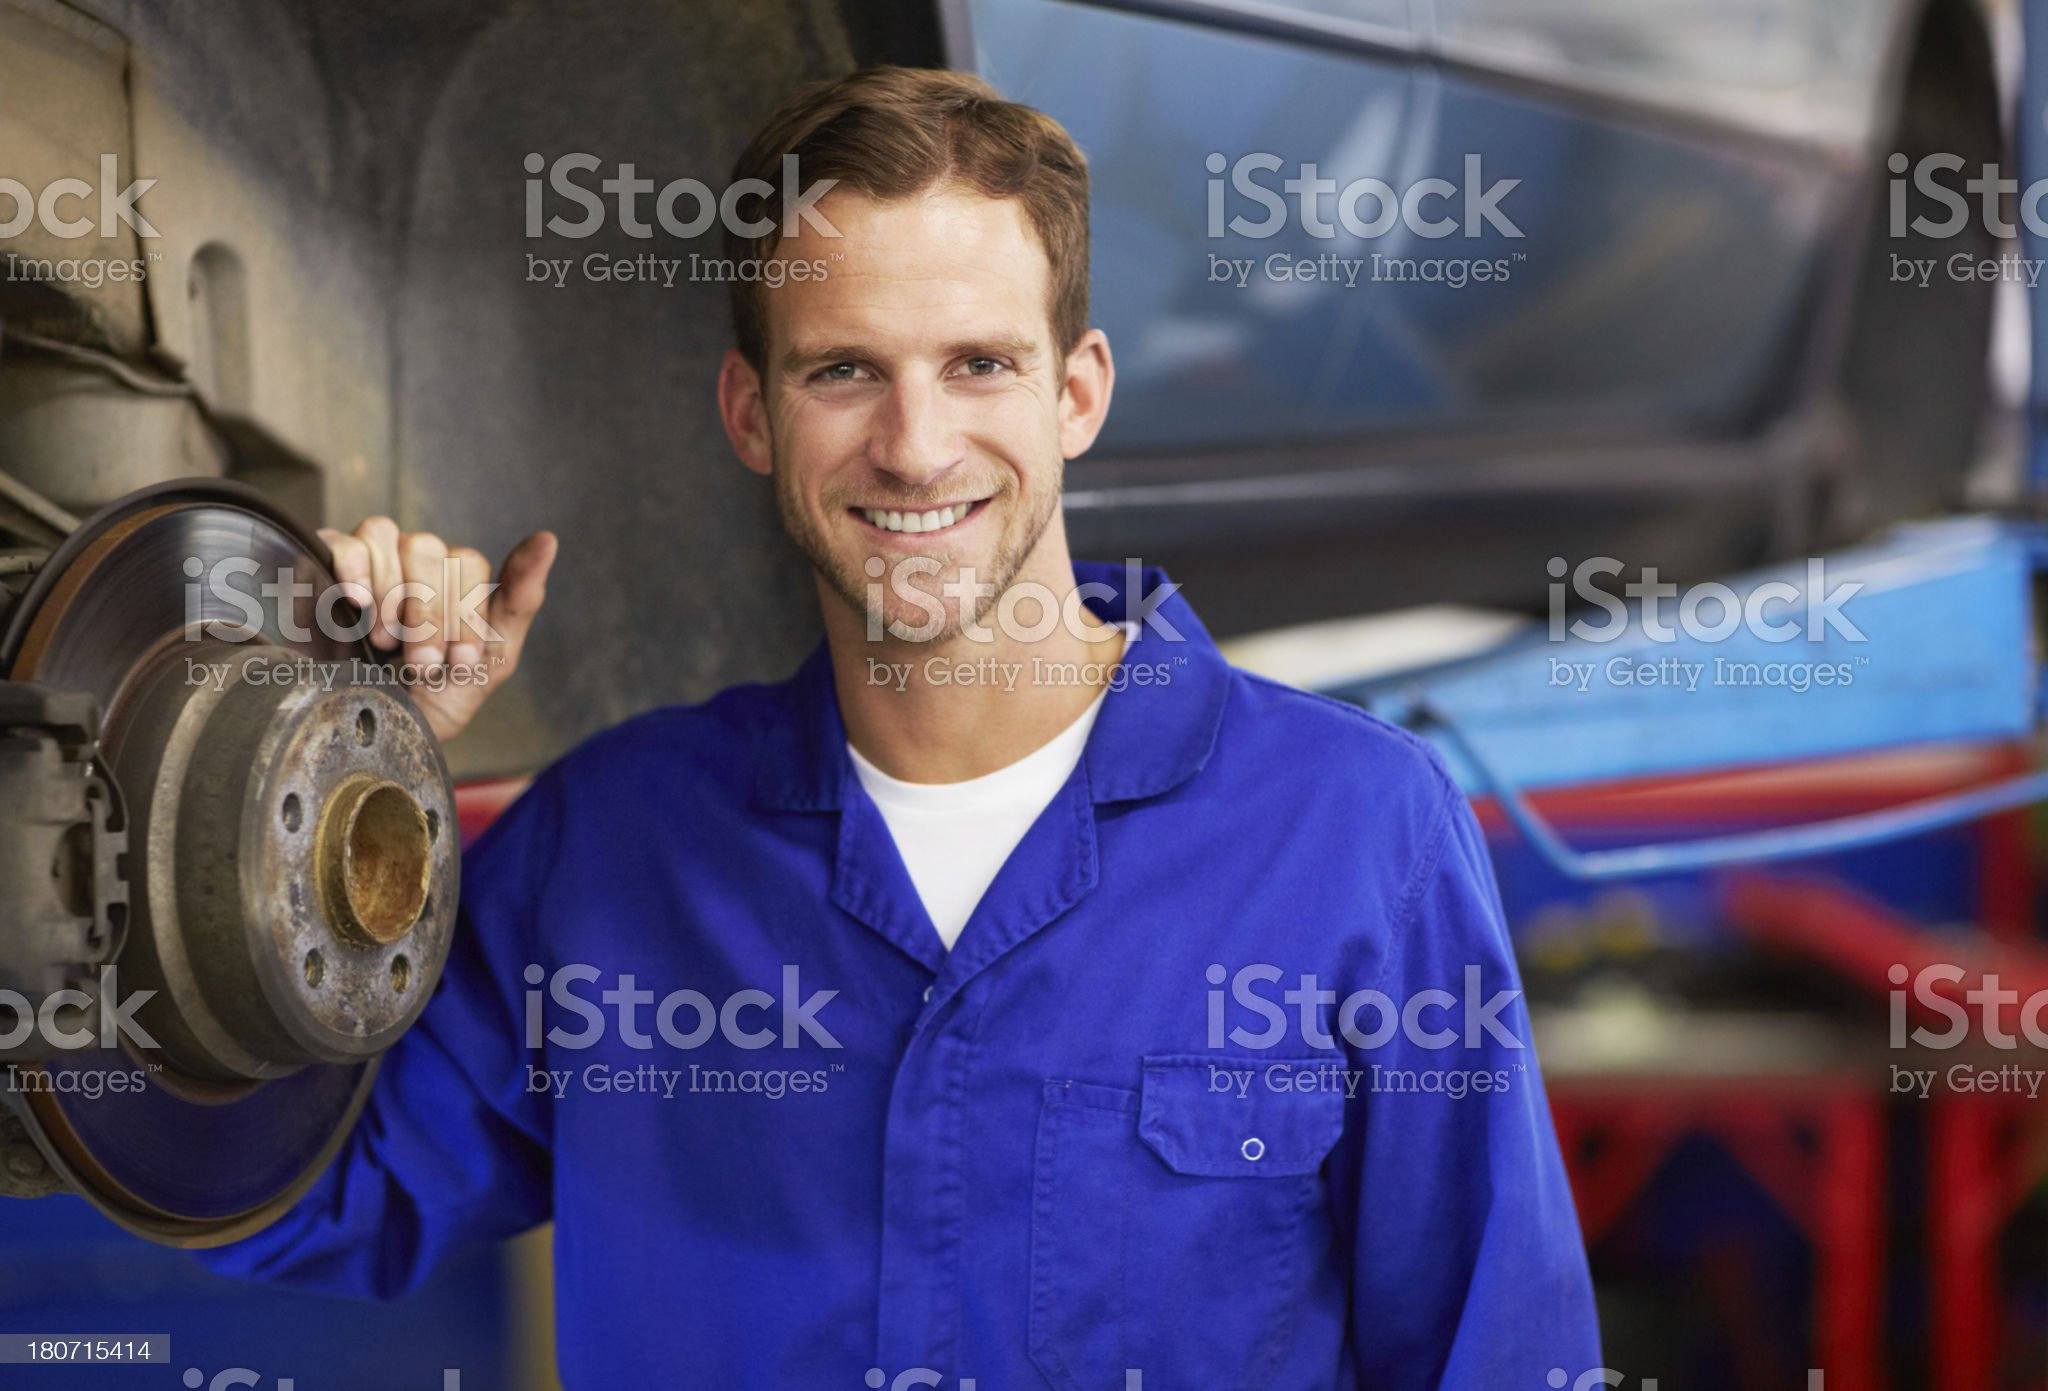 He's a confident automotive pro! royalty-free stock photo